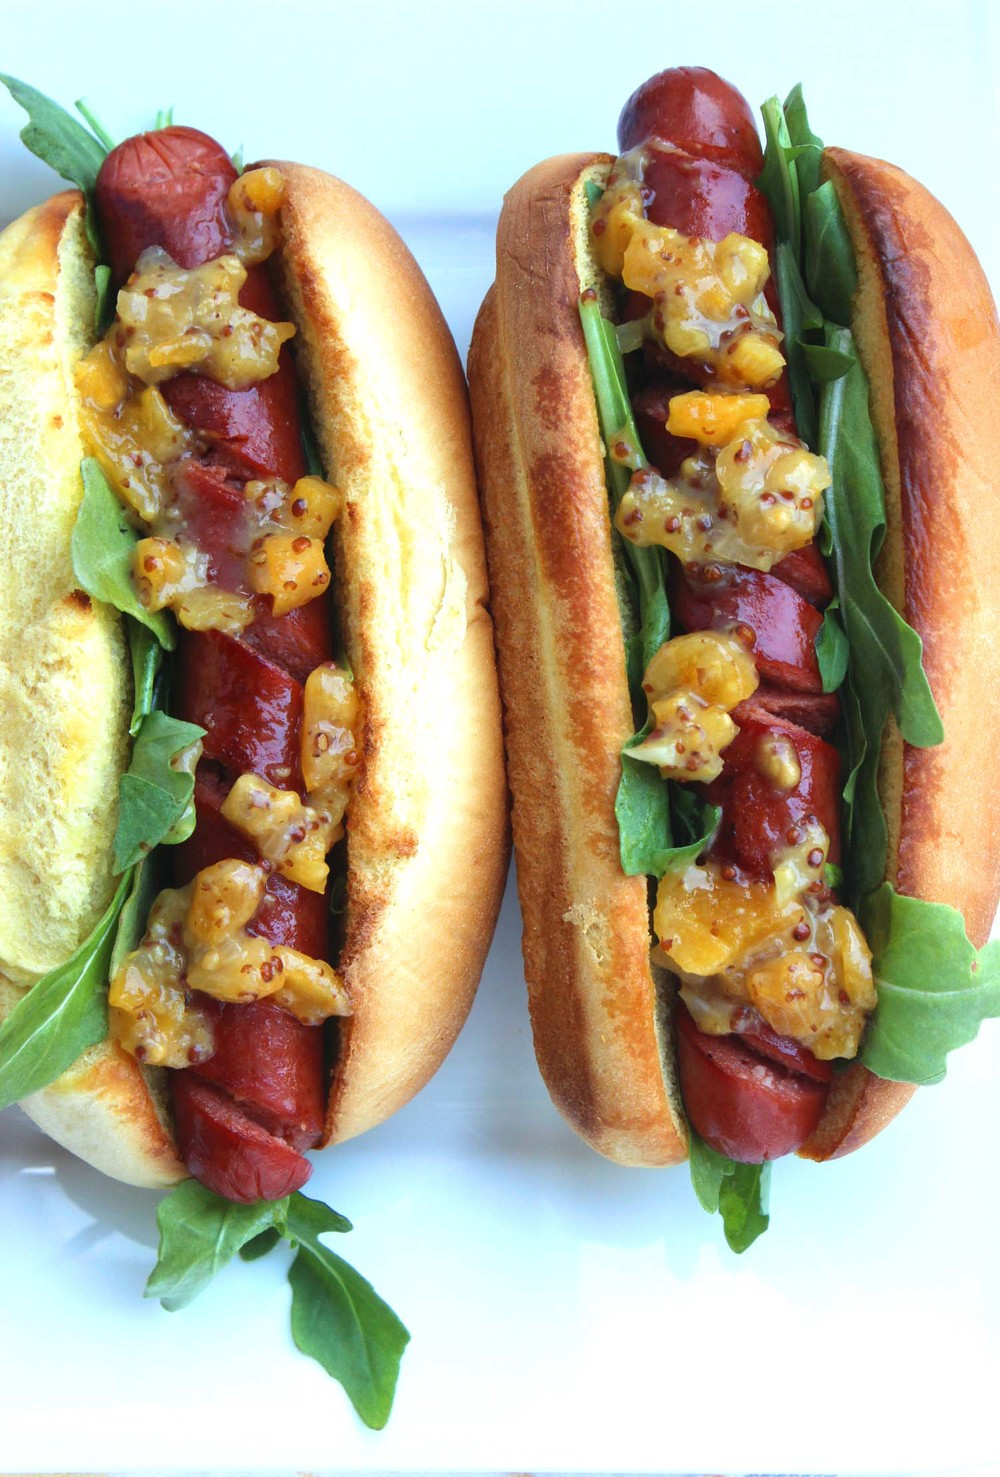 Apricot Mostarda & Spiralized Hotdogs  | Image:  Laura Messersmith